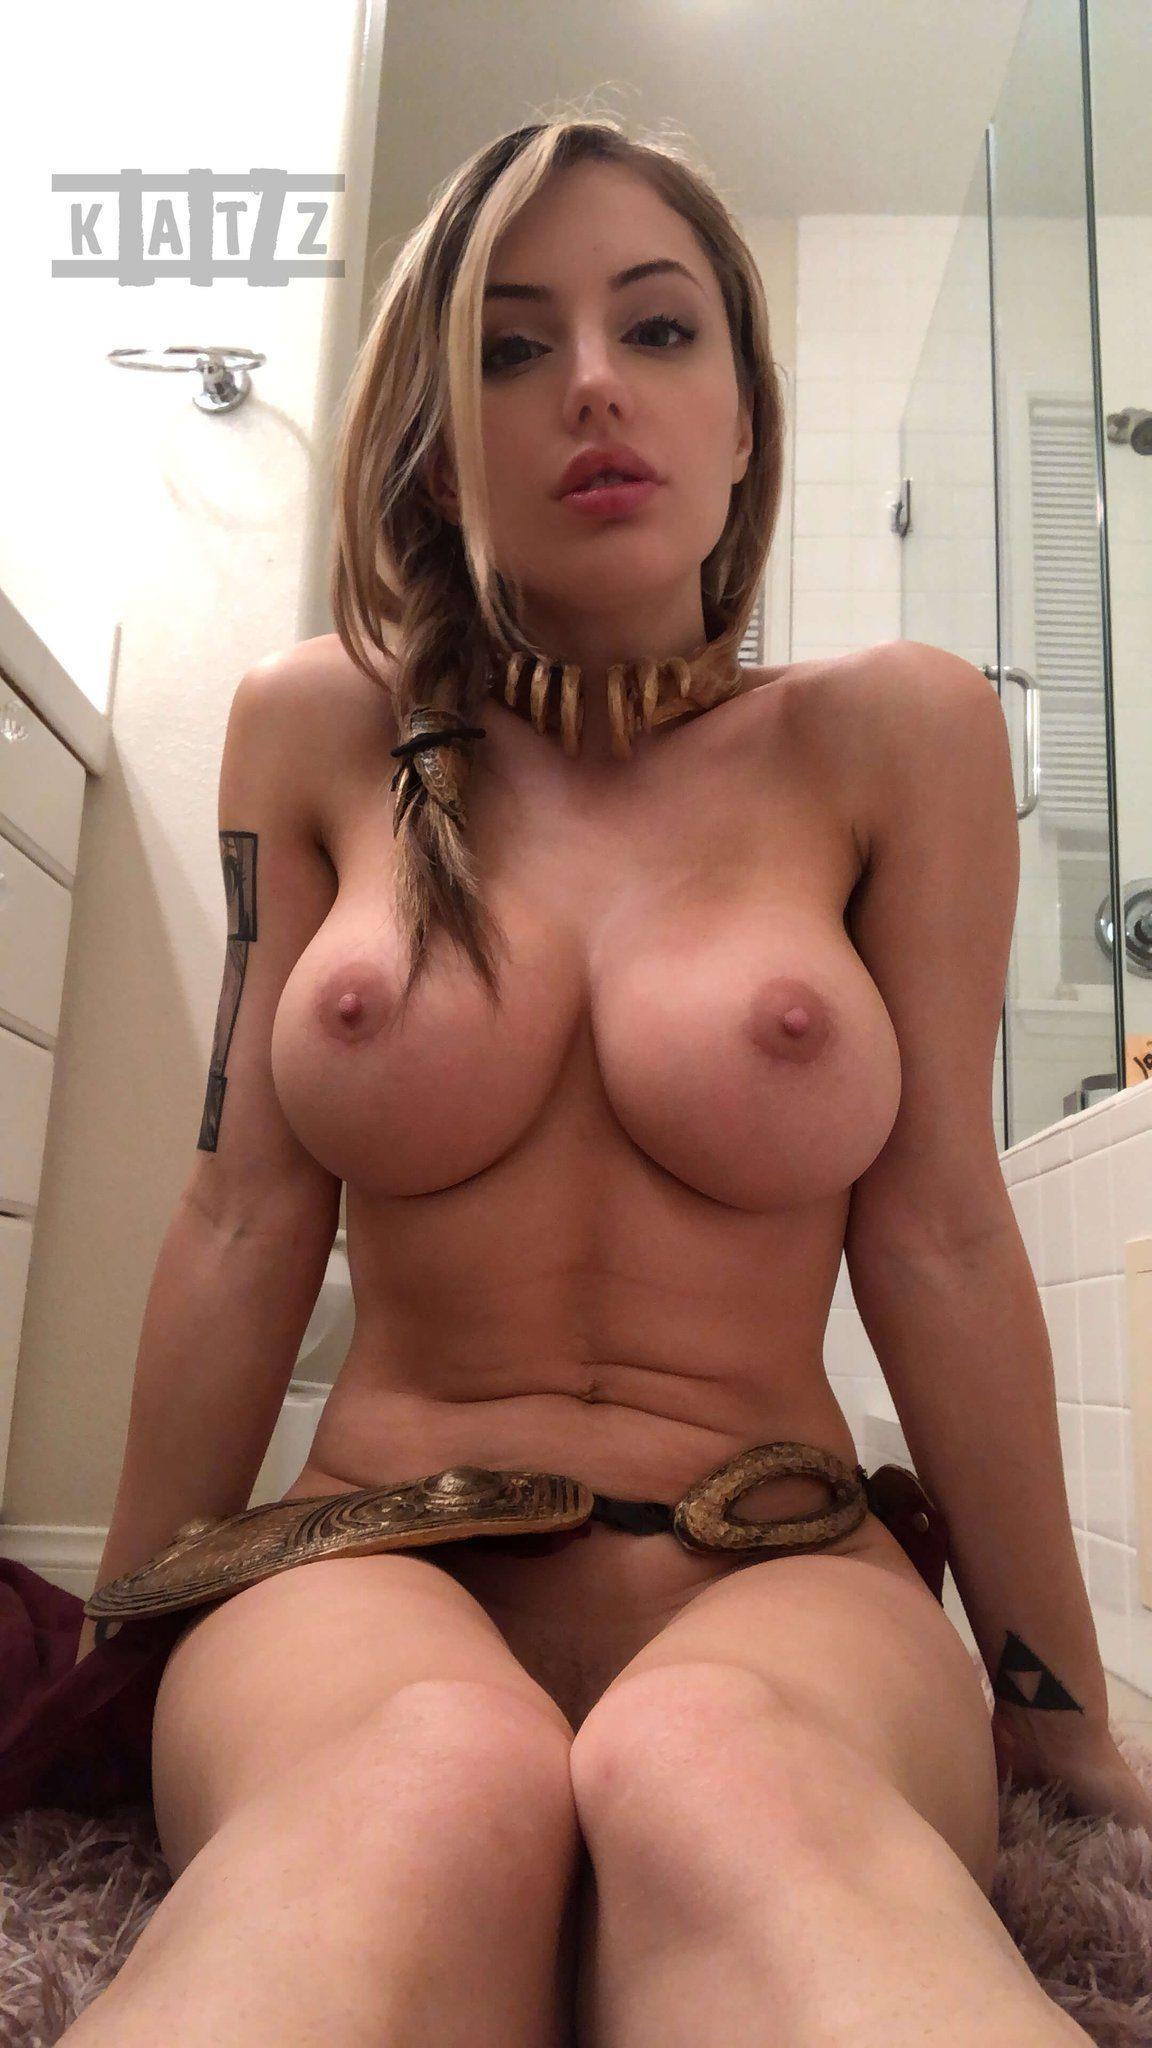 Liz Katz Slave Leia Nude Cosplay Onlyfans Leaked Photos 16